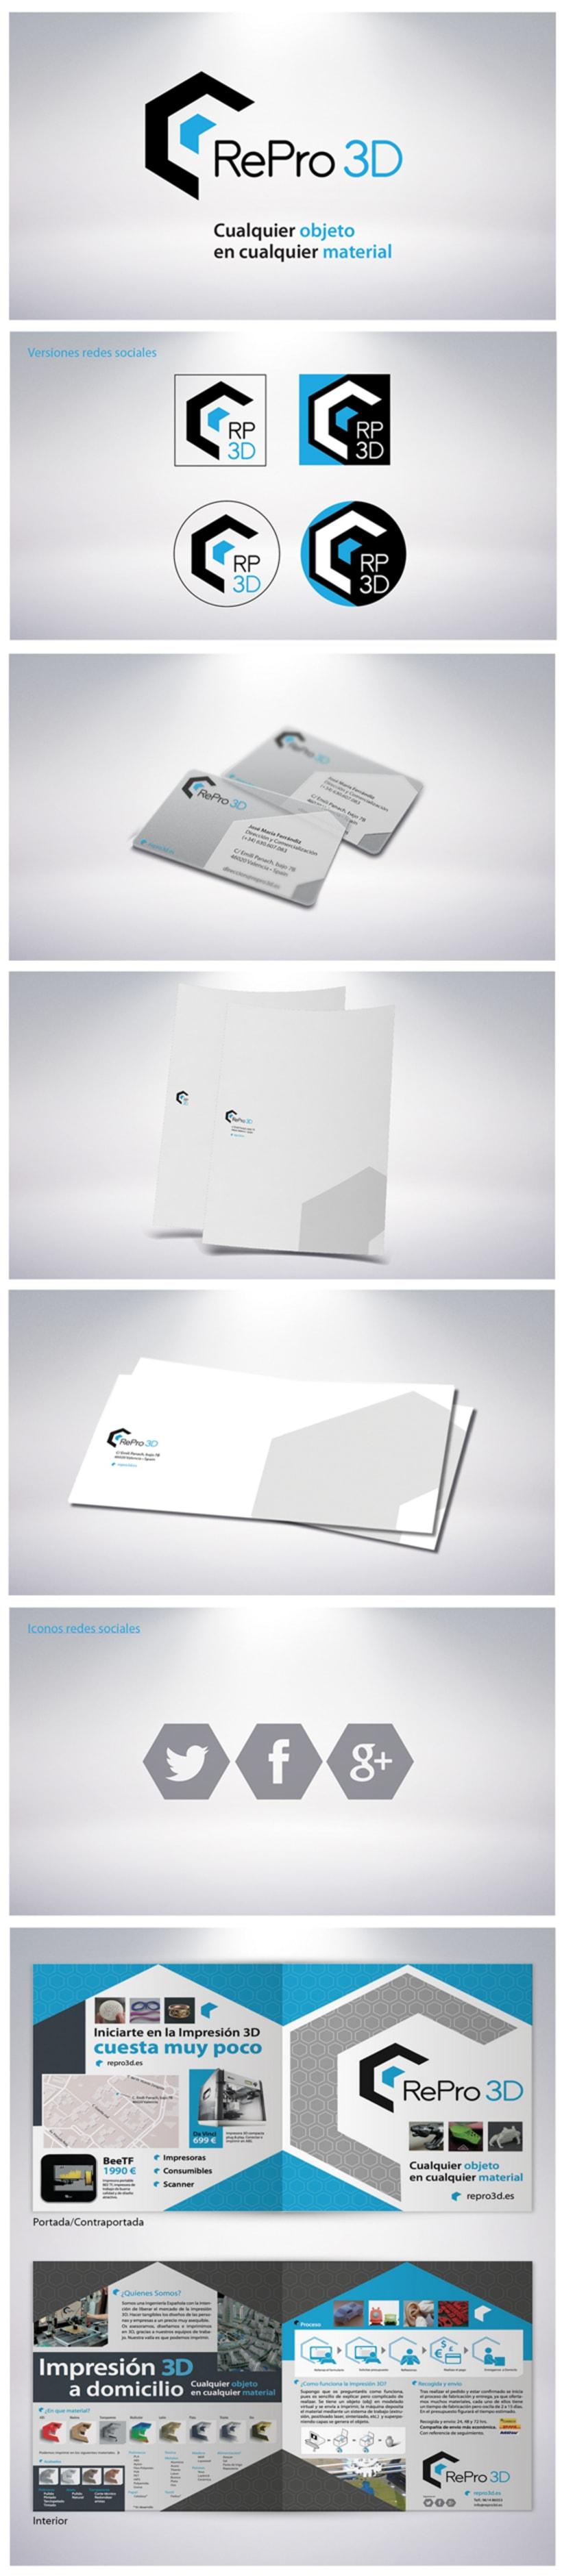 Imagen Corporativa Repro 3D 0